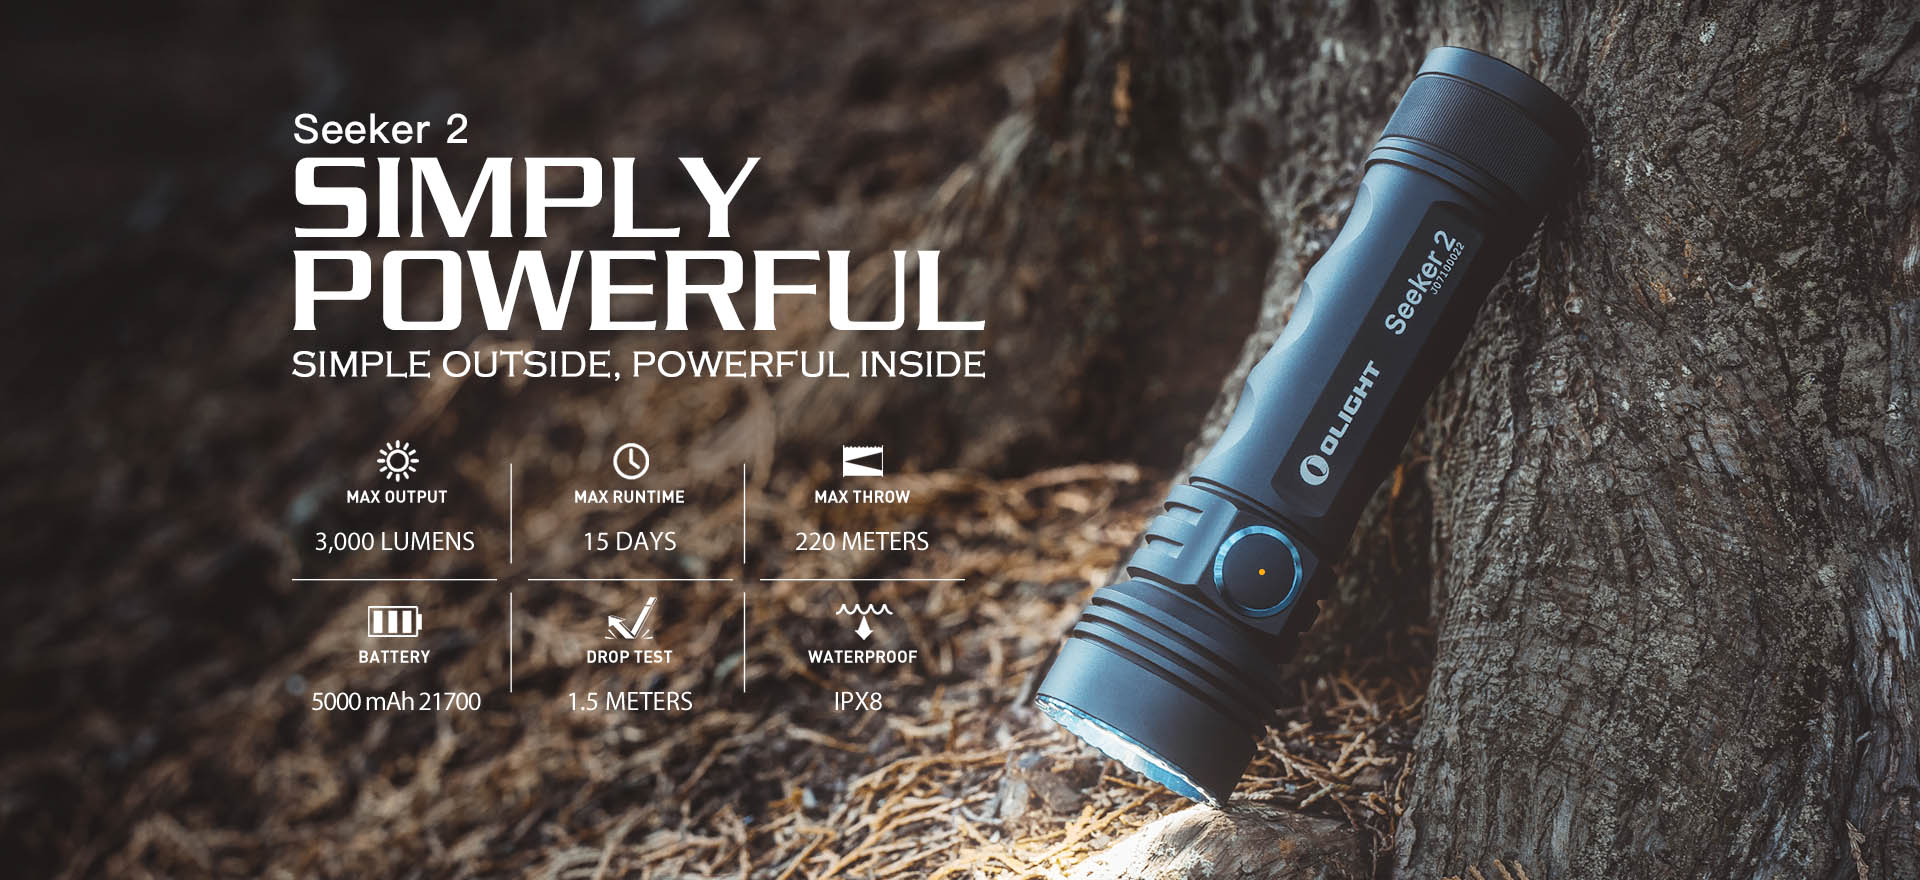 Seeker 2 high power flashlight 3000 lumens